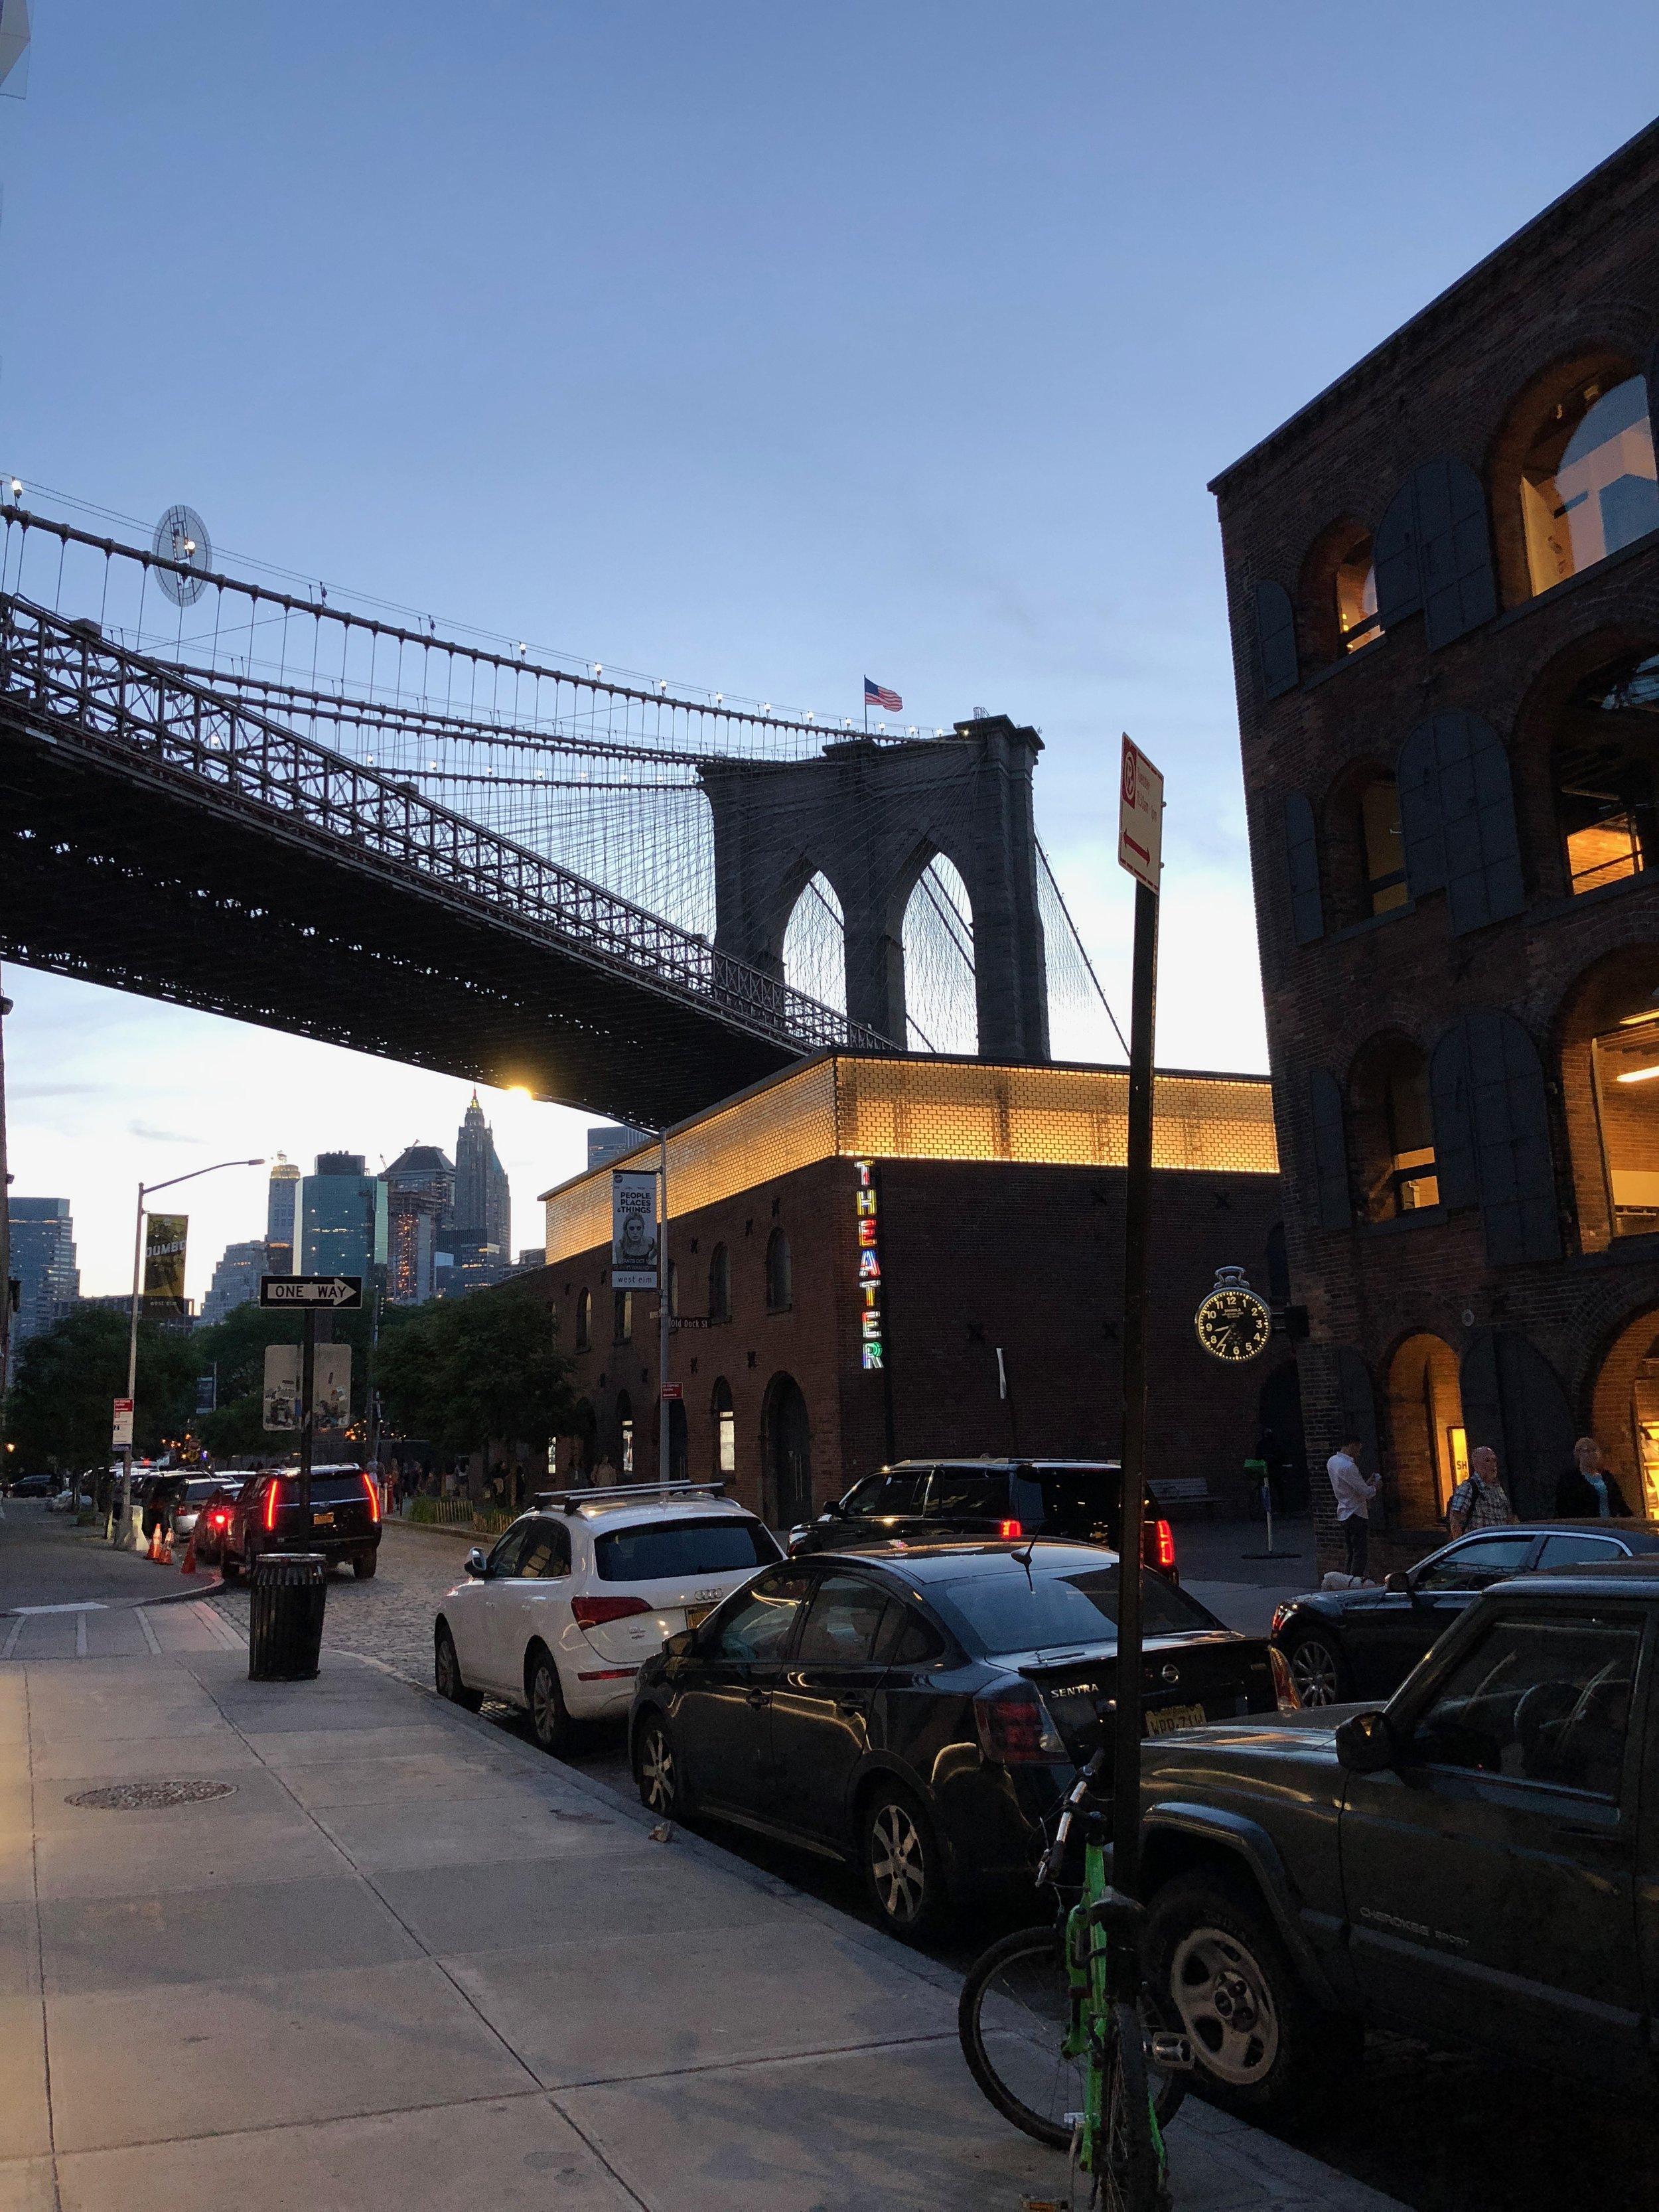 Shot in DUMBO (Down Under the Manhattan Bridge Overpass)